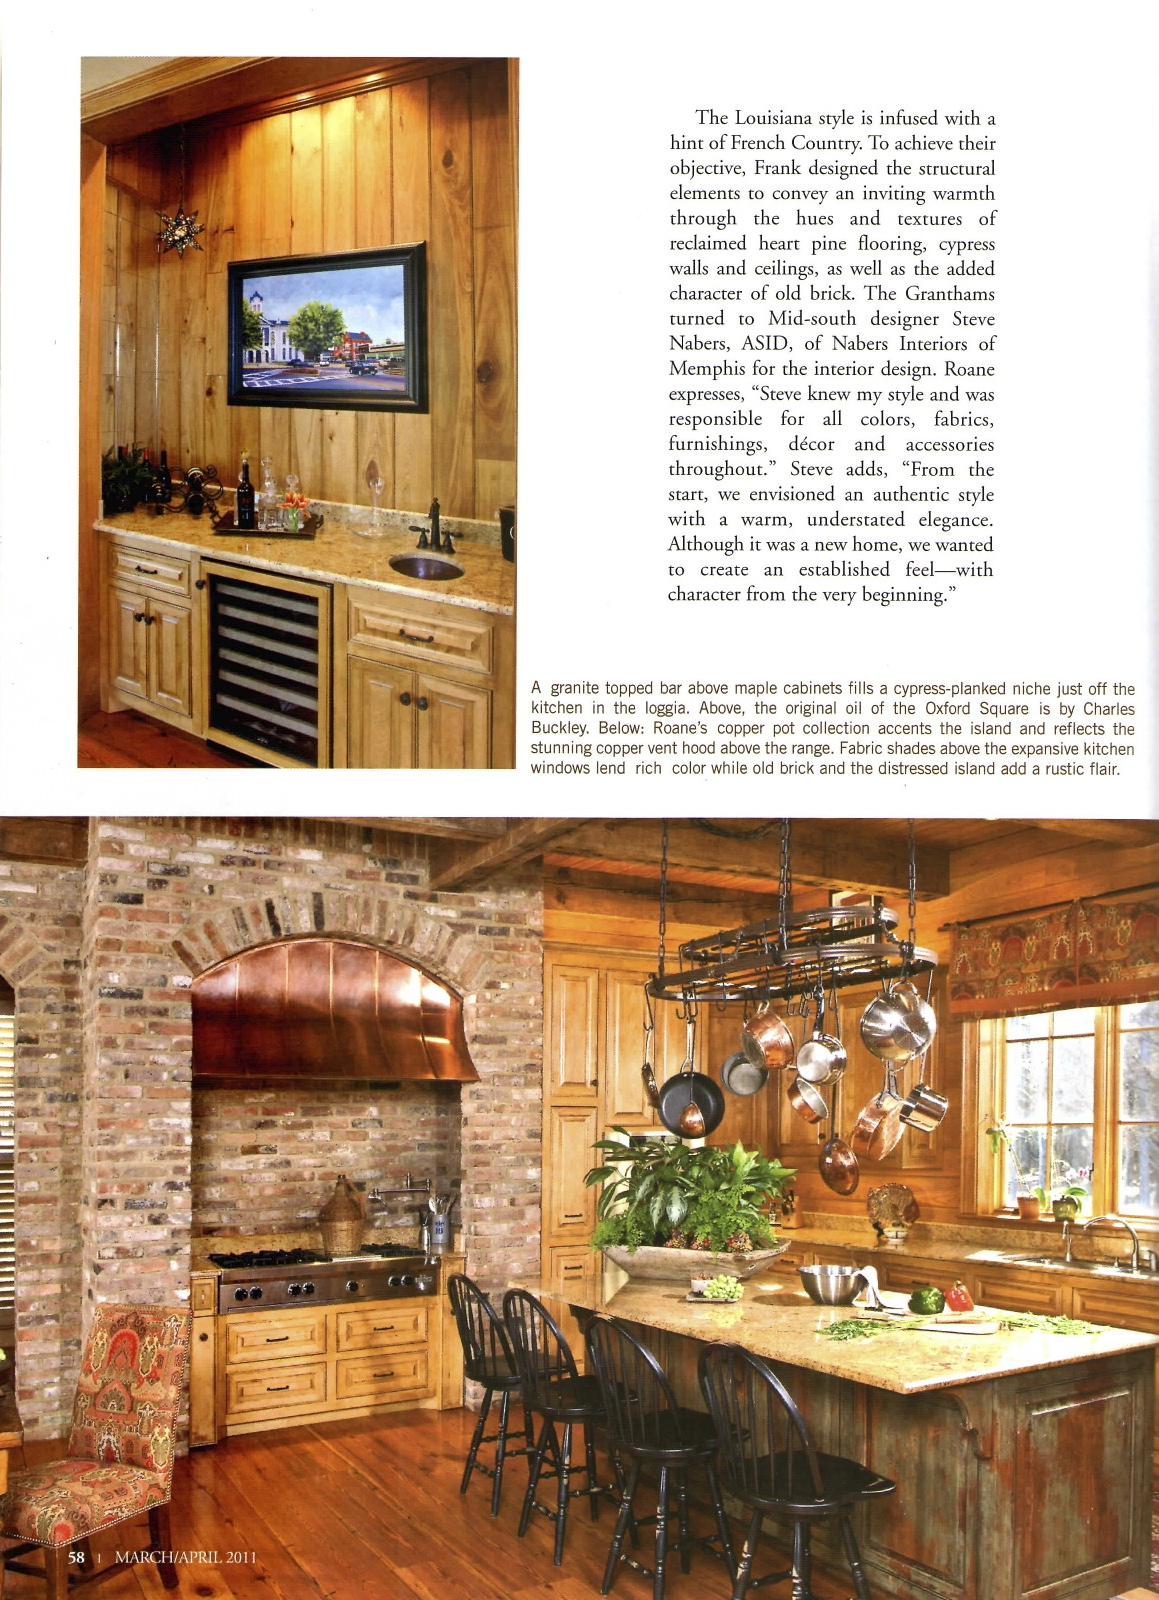 Grantham article - Delta Magazine -March April 2011 5.jpeg